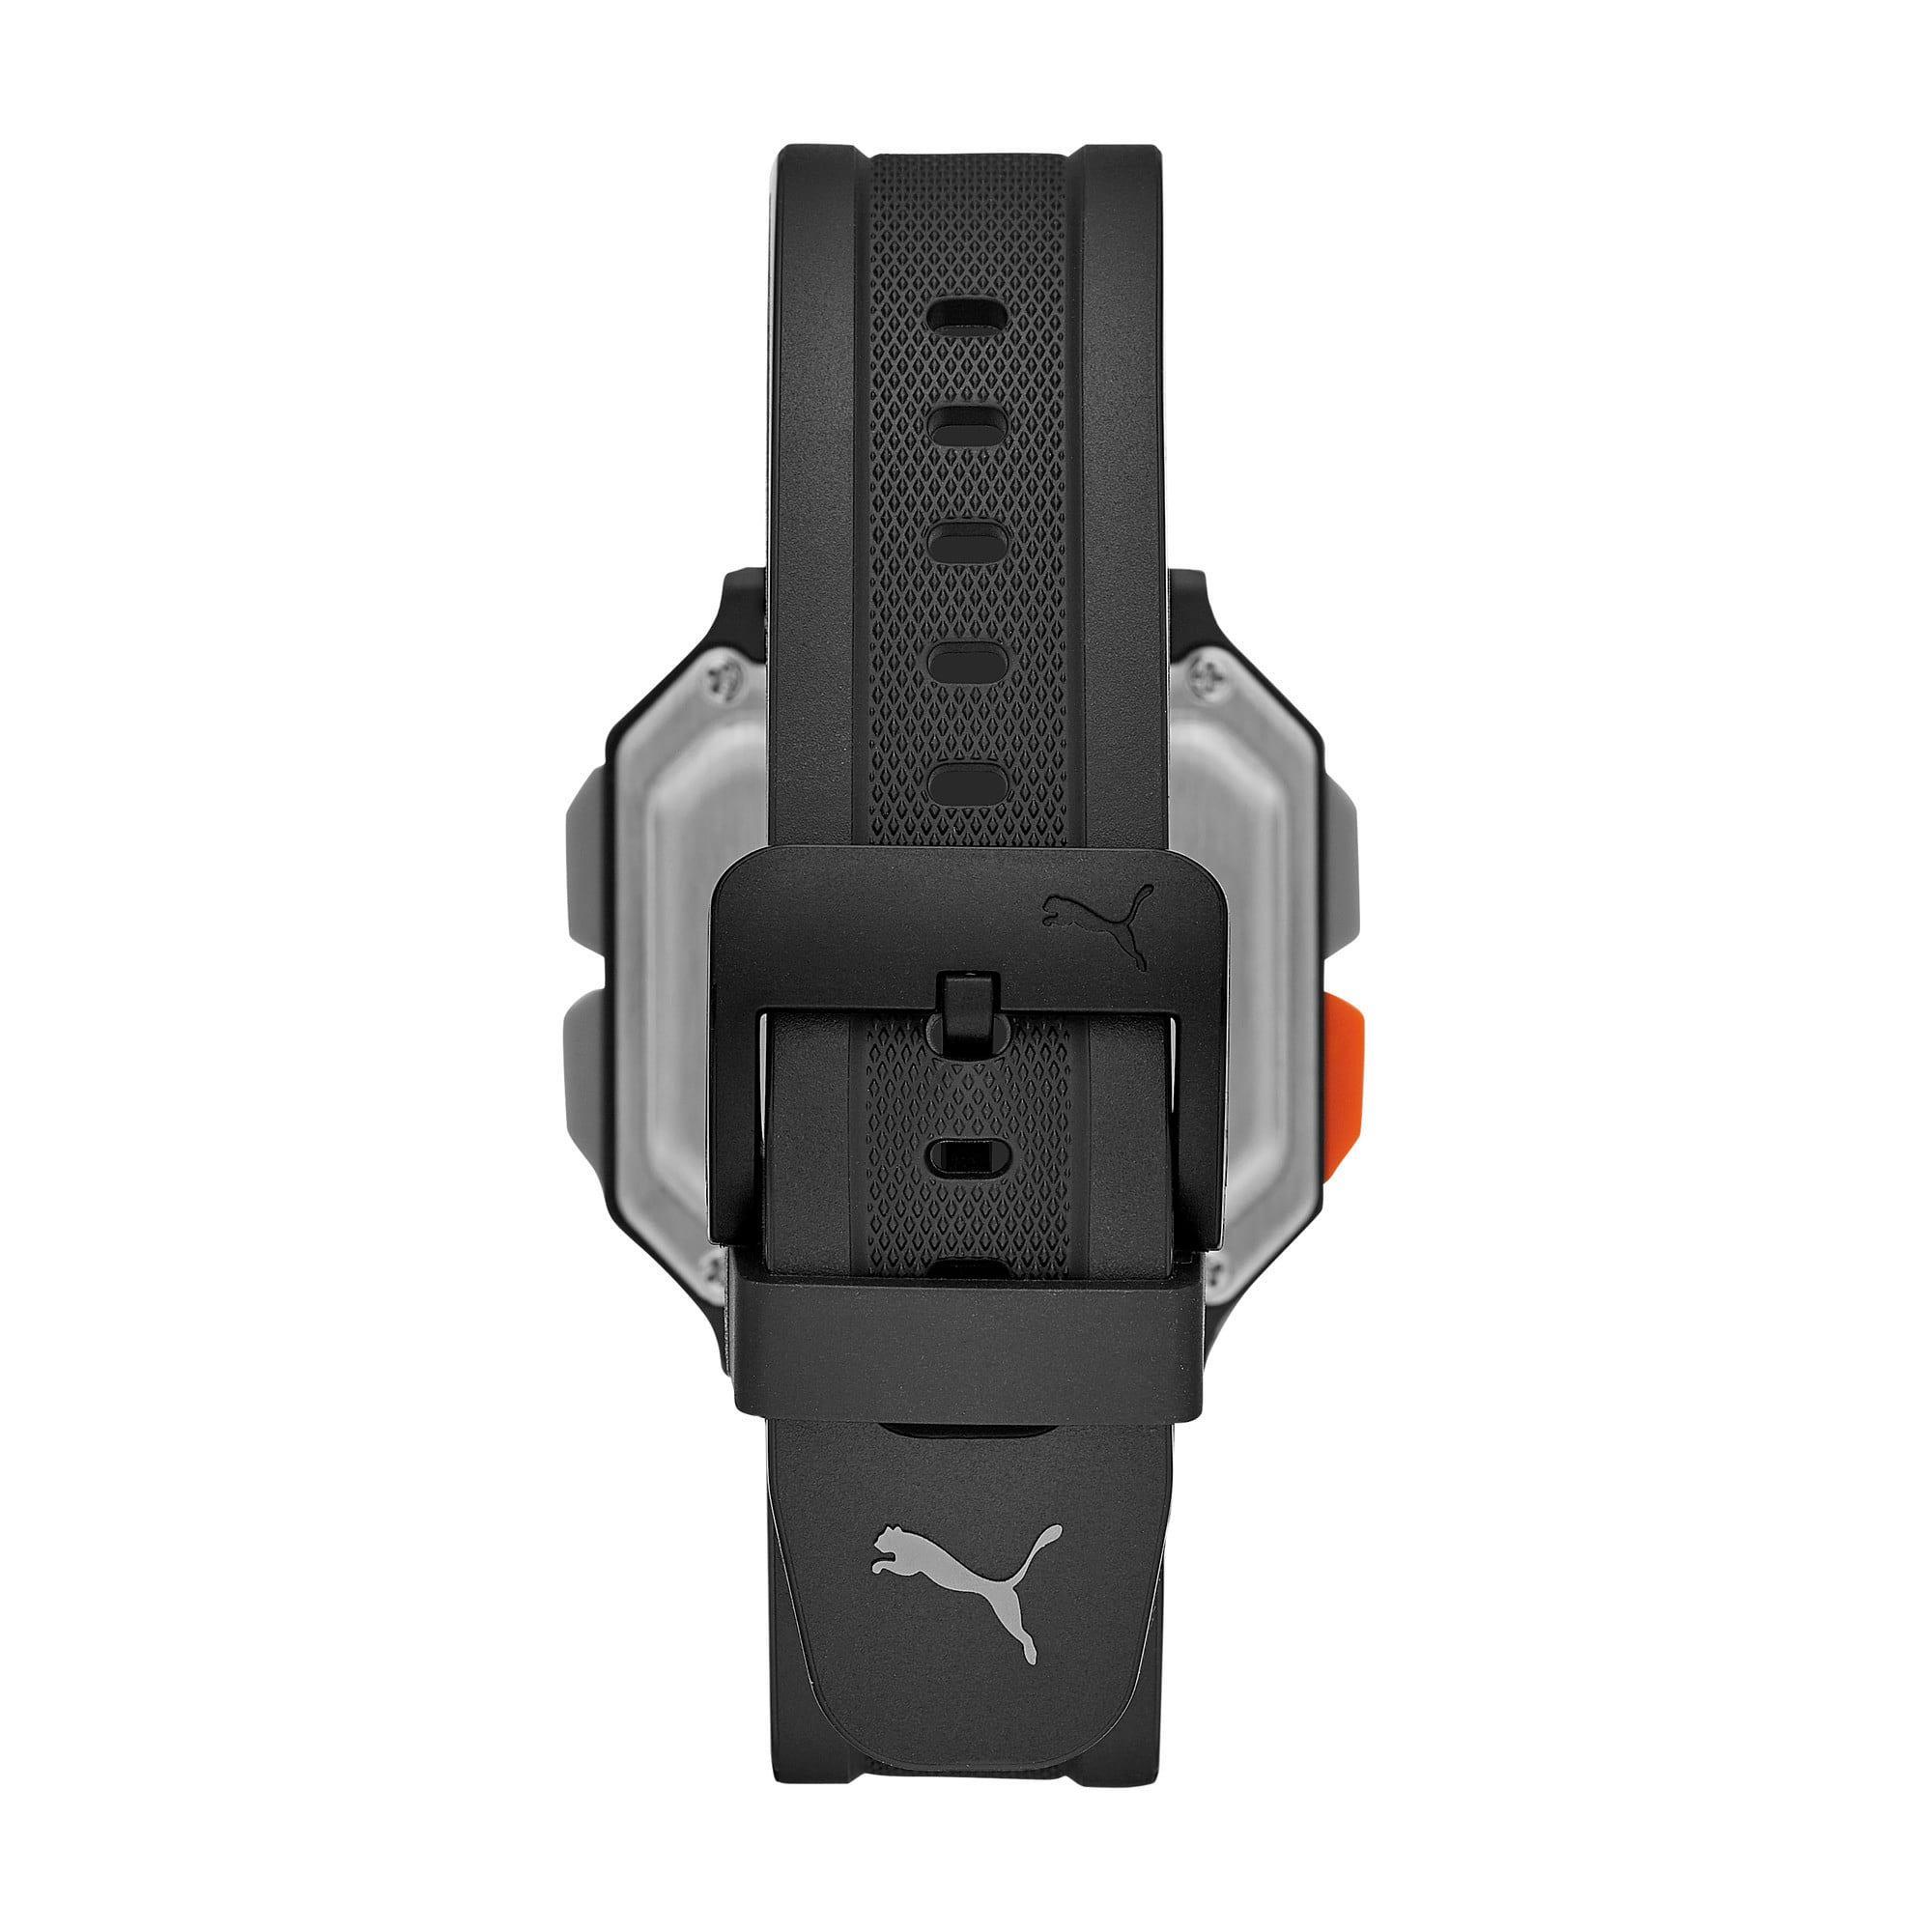 Thumbnail 2 of Reset Black Digital Watch, Black/Black, medium